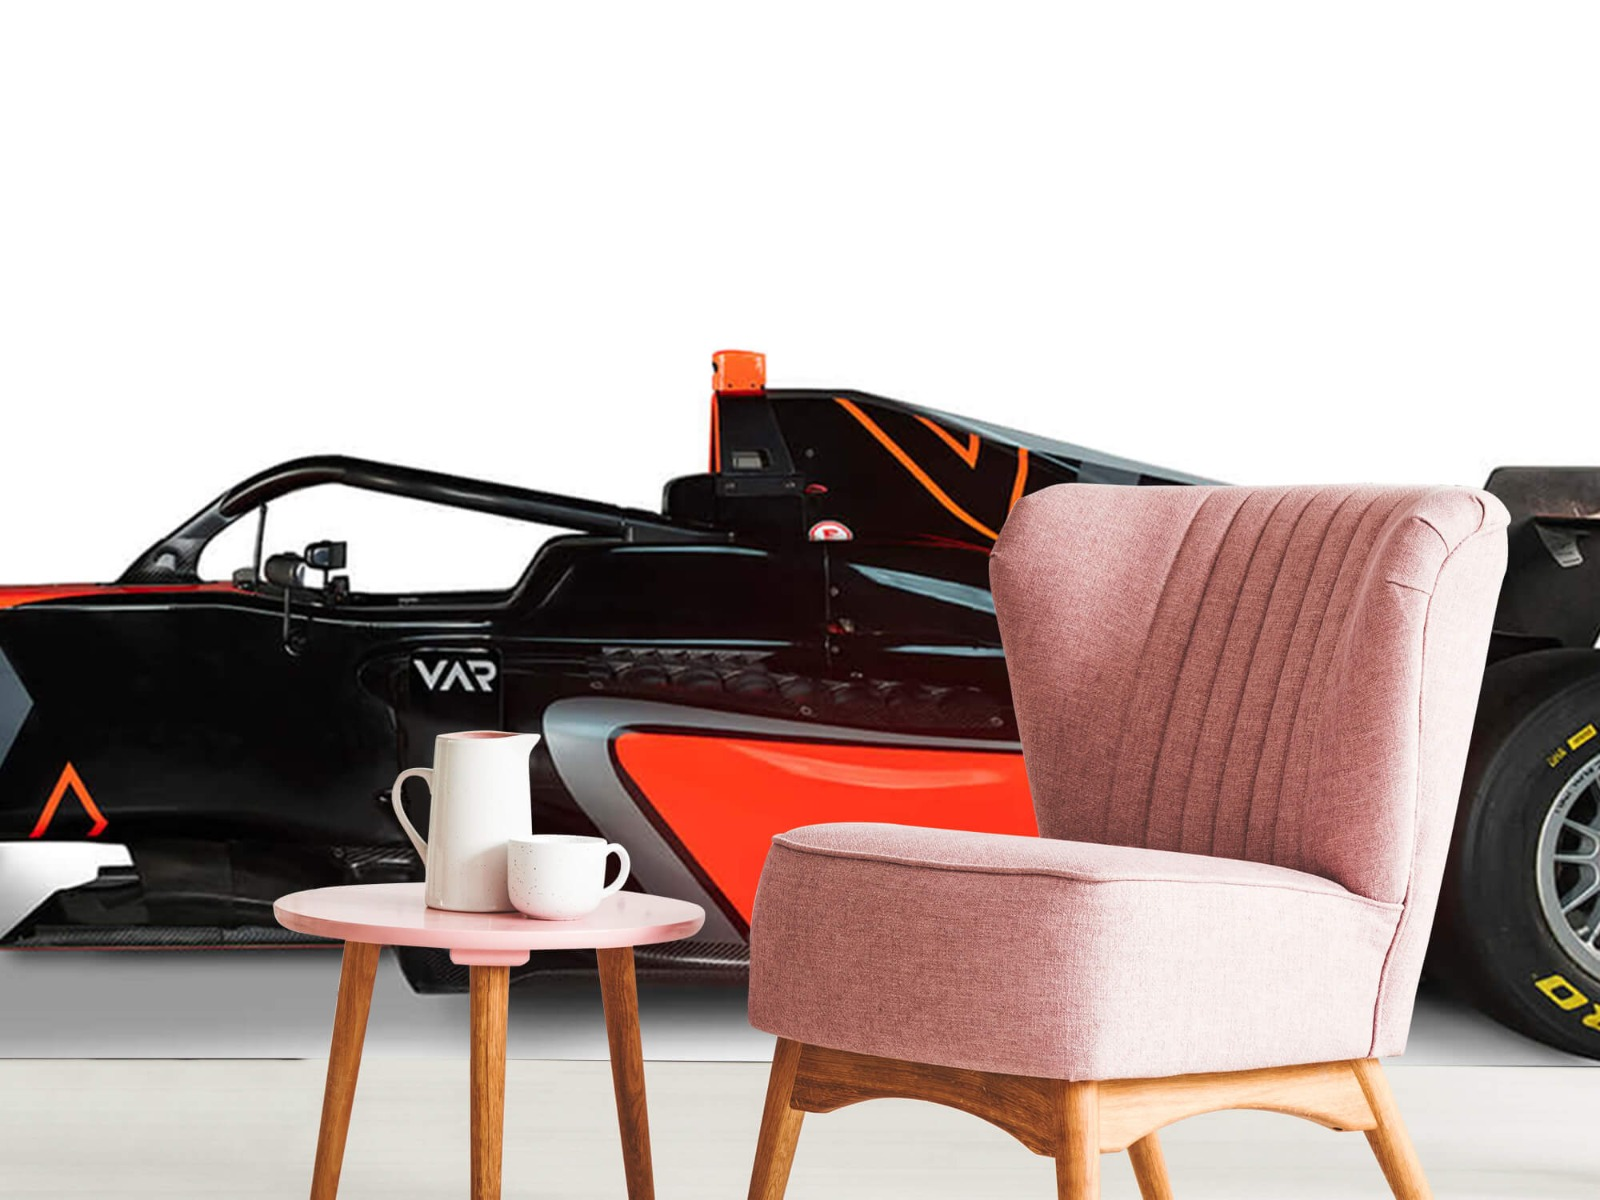 Sportauto's - Formule 3 - Lower side view - Computerruimte 9